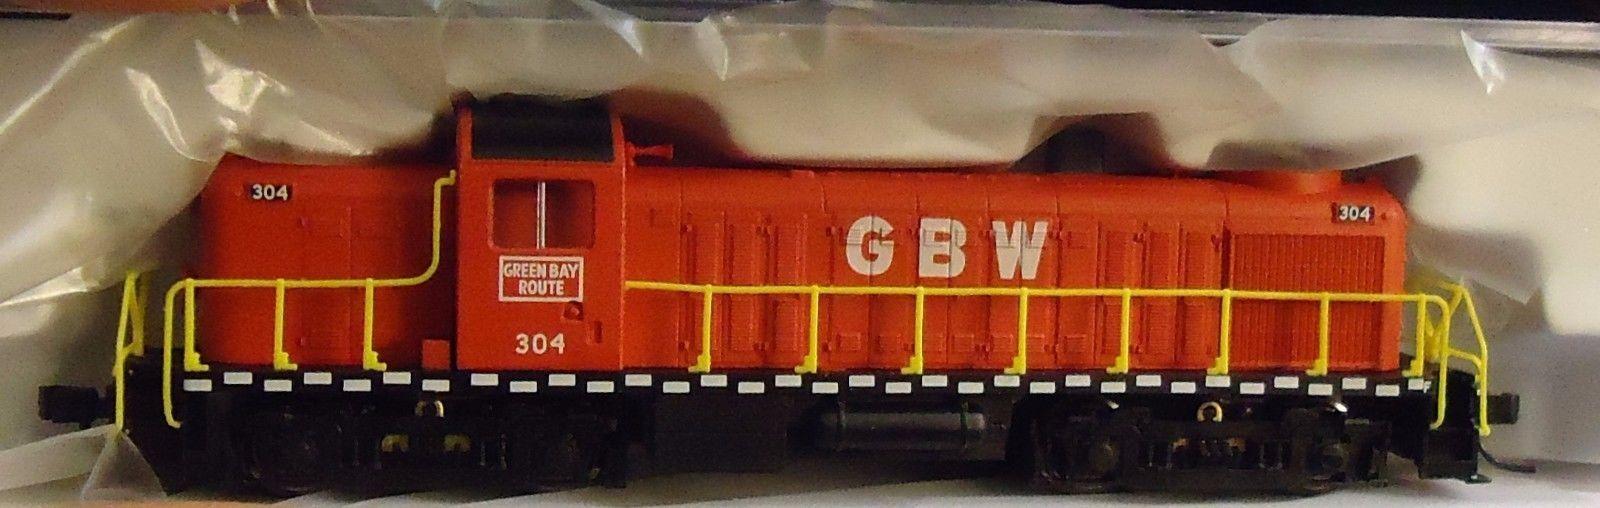 N Scale - Life-Like - 80081 - Locomotive, Diesel, Alco RS-2 - Green Bay & Western - 304